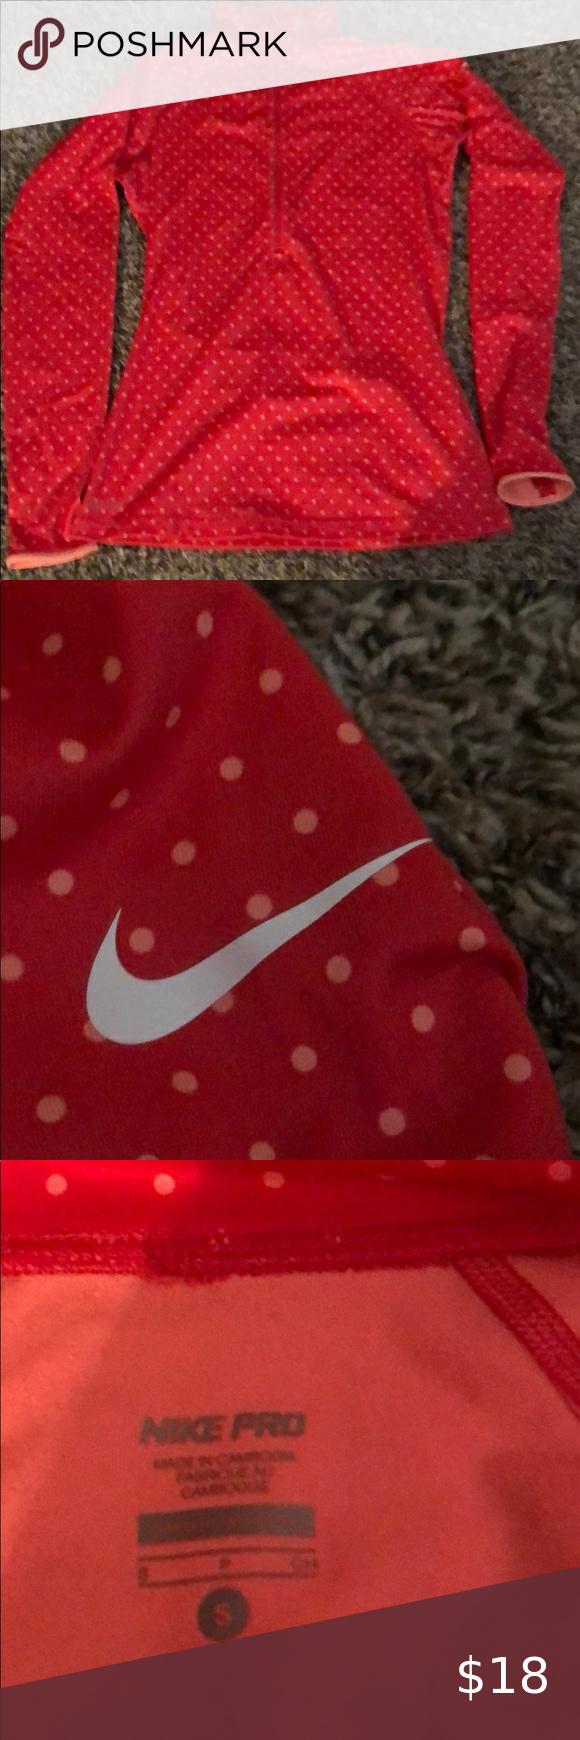 Predownload: Nike Top Guc Zip Up Polka Dot Thumb Holes Nike Tops Sweatshirts Hoodies Nike Tops Sweatshirts Hoodie Sweatshirt Tops [ 1740 x 580 Pixel ]